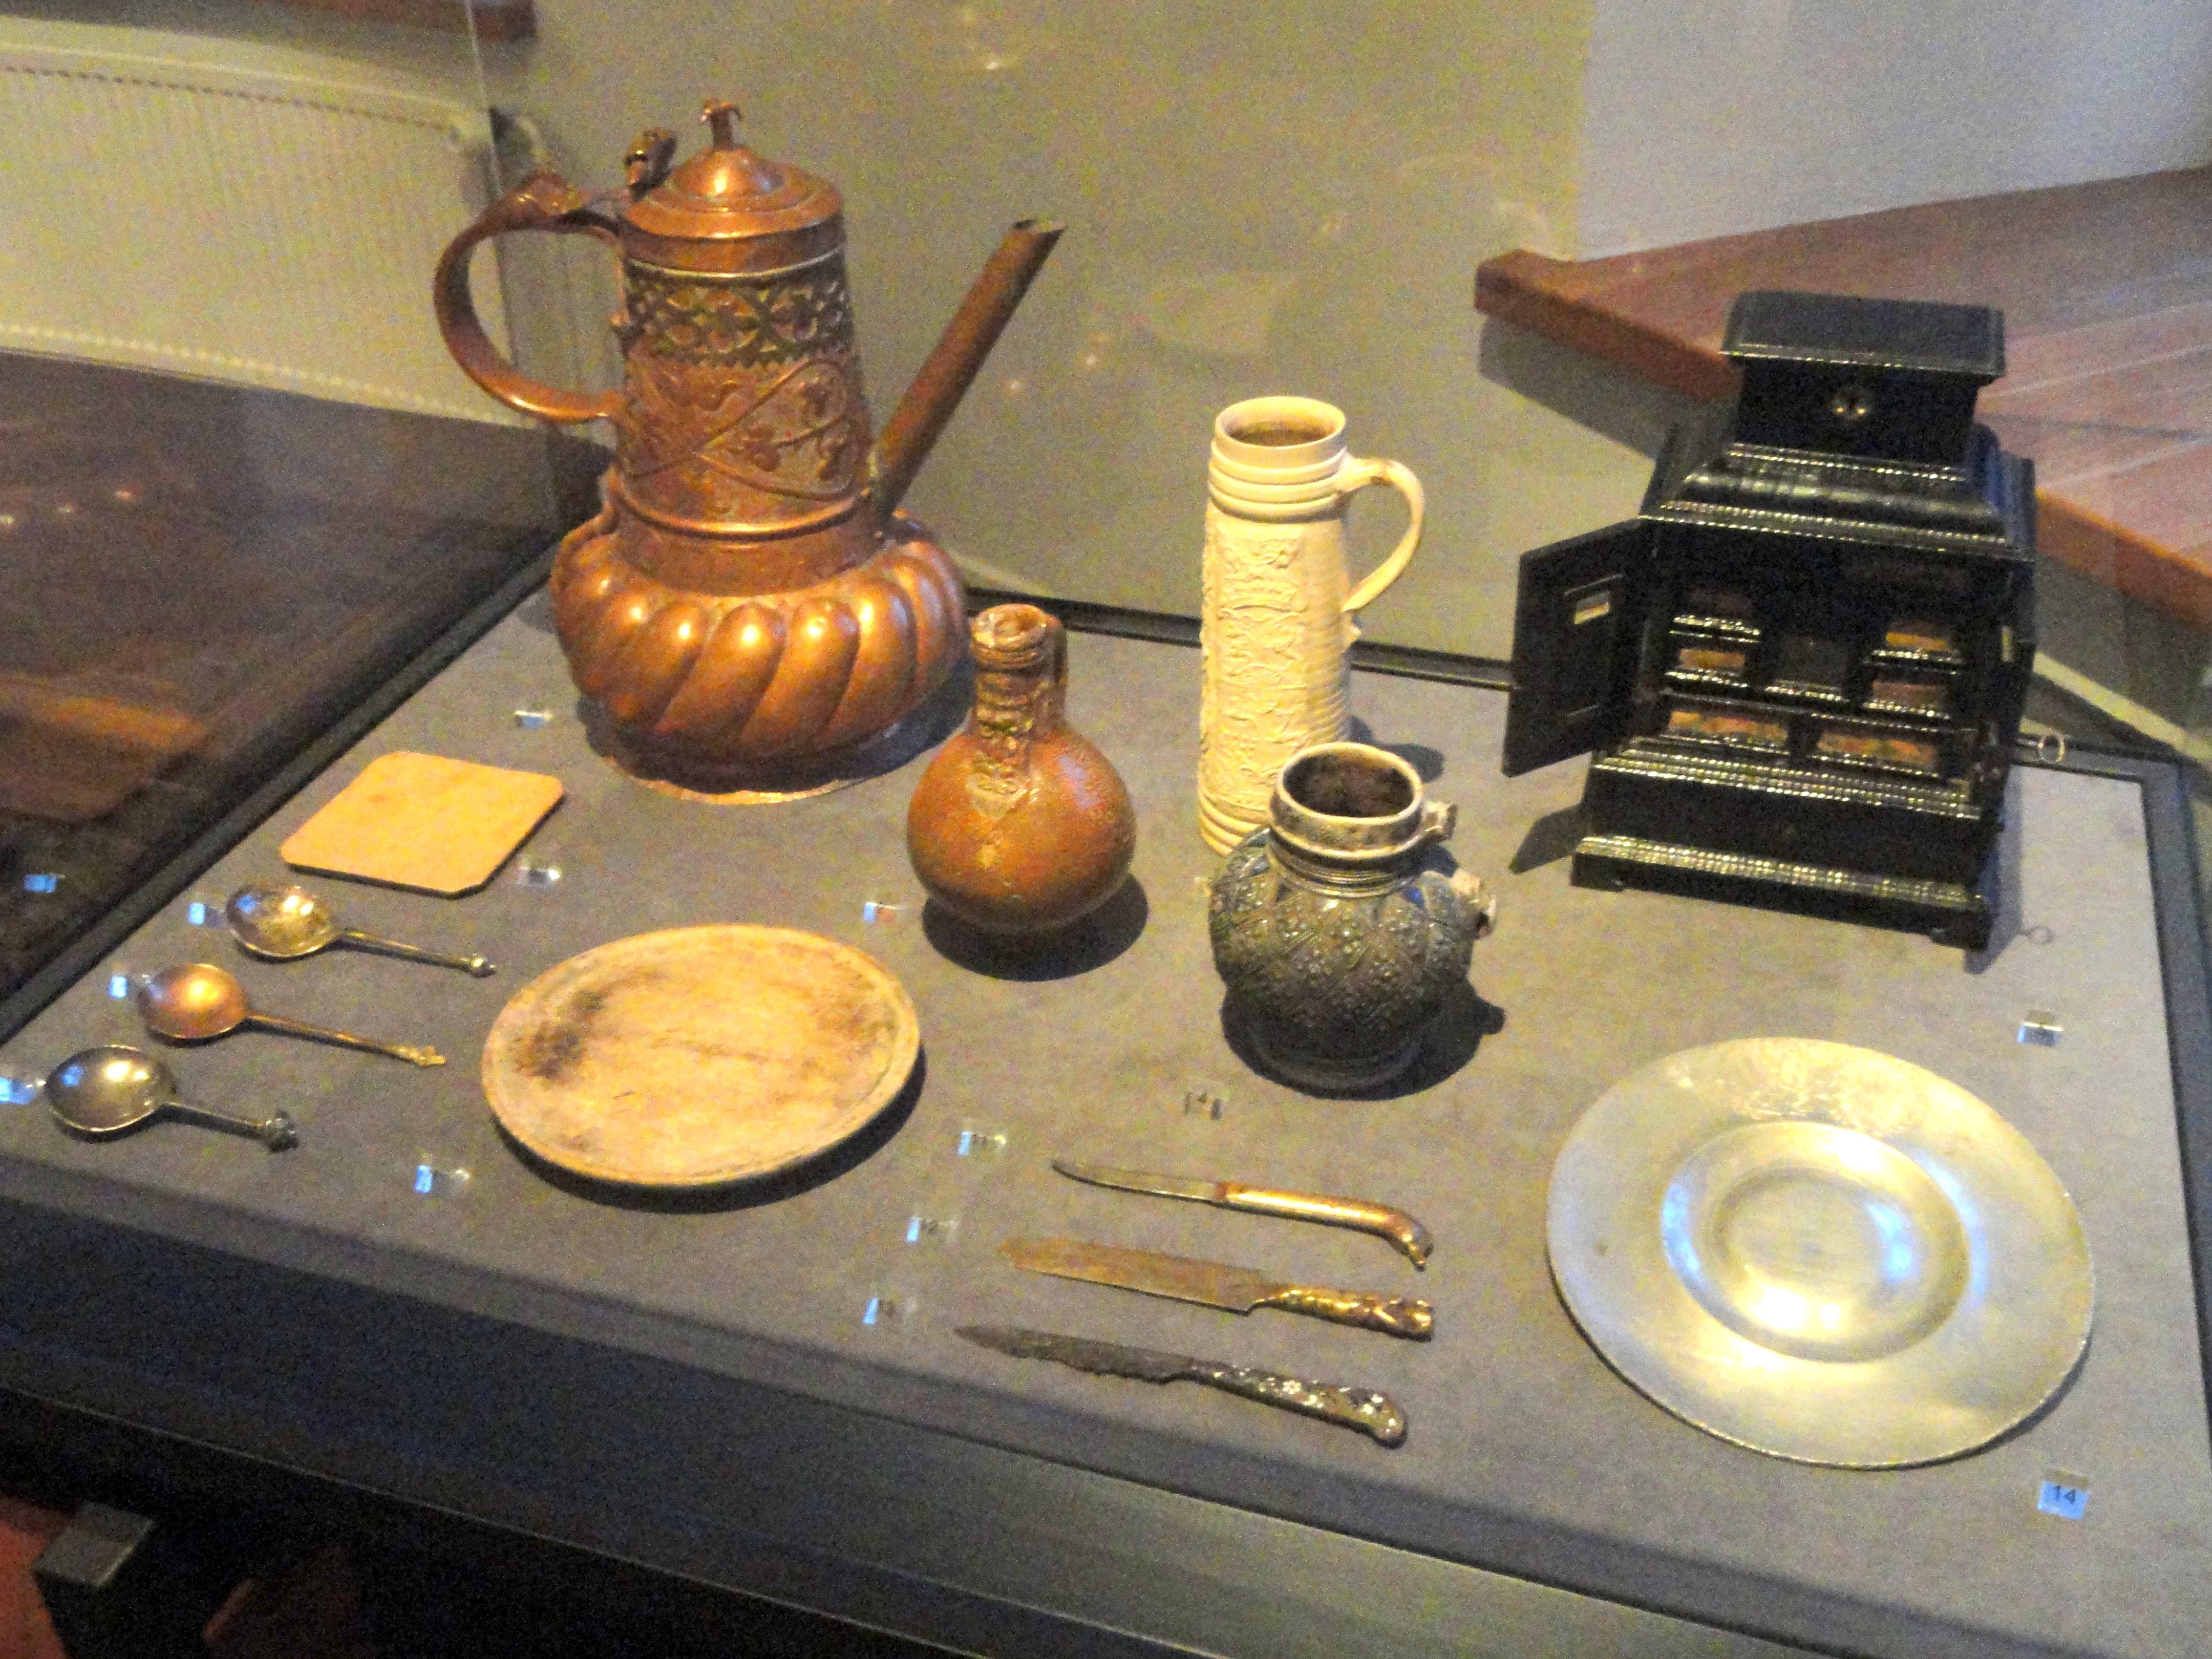 FileTableware 17th century - National Museum of Finland - DSC04256.JPG & File:Tableware 17th century - National Museum of Finland - DSC04256 ...